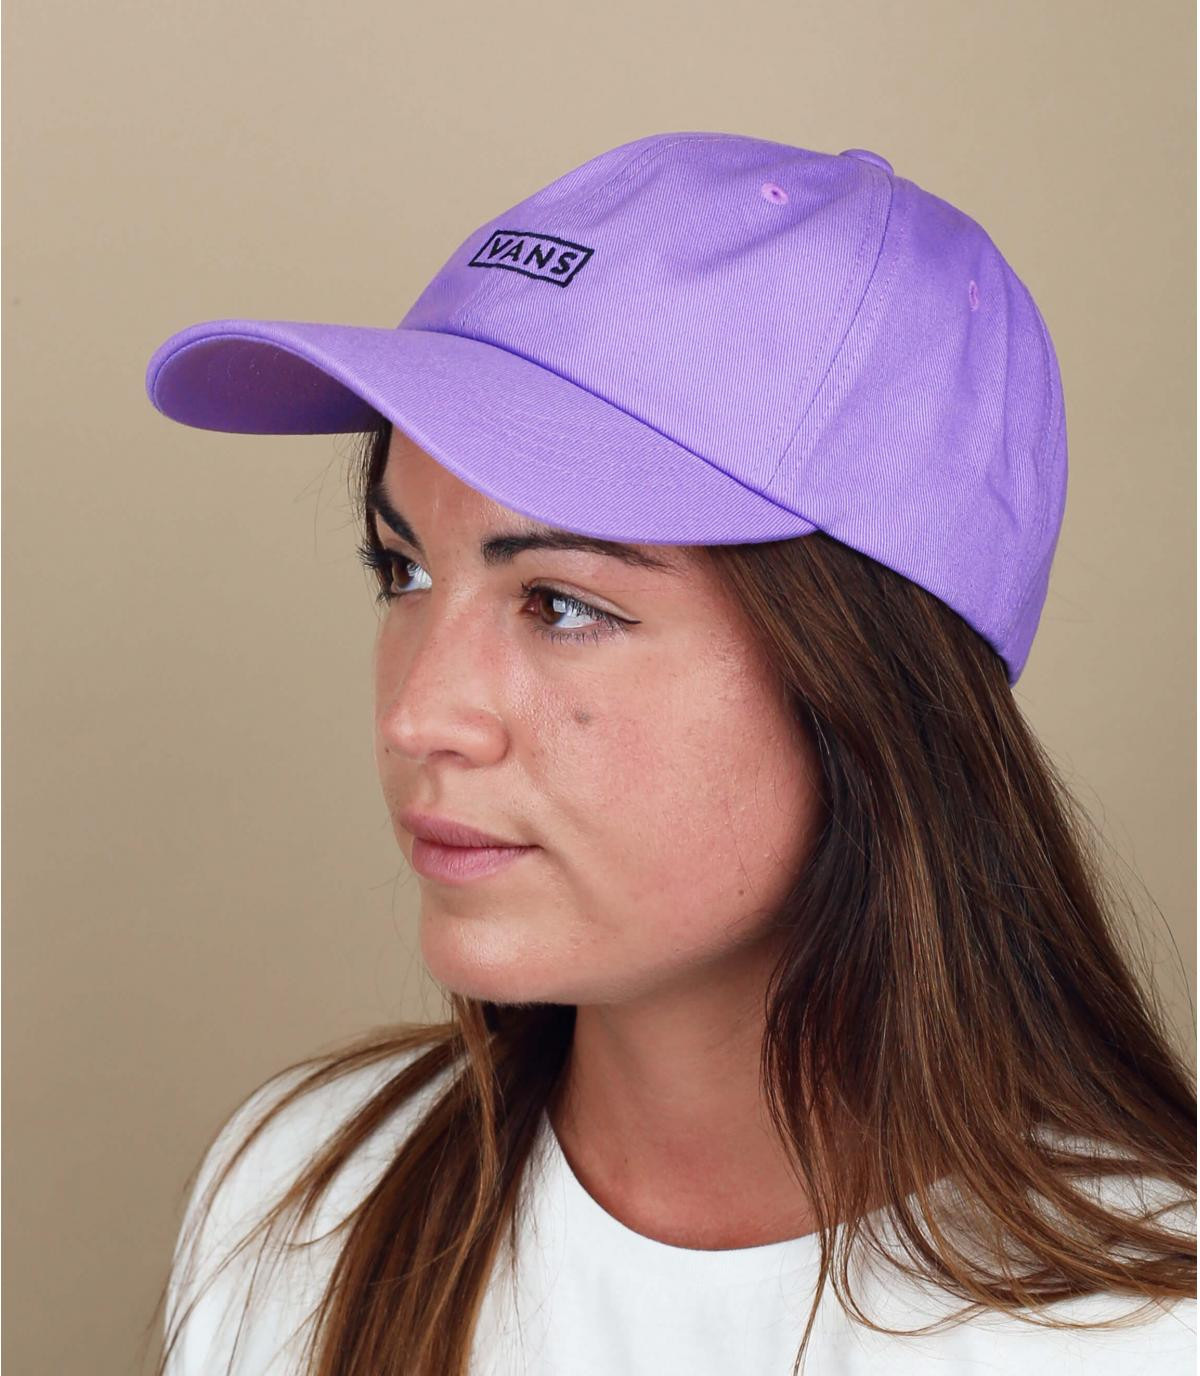 Purple Vans cap woman